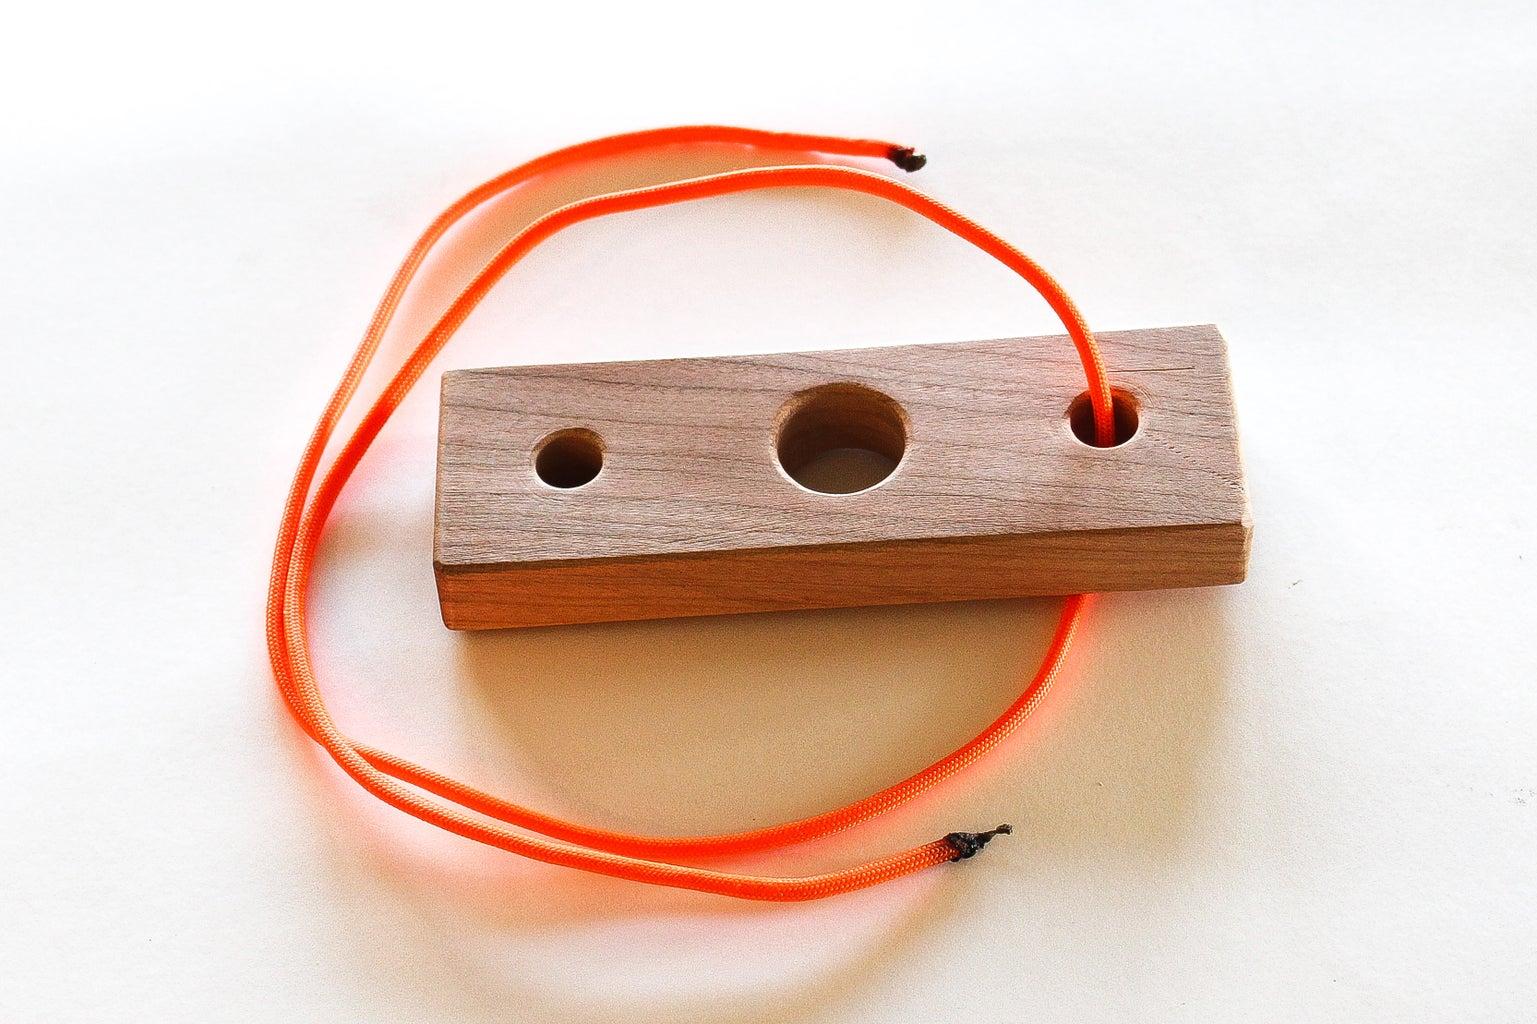 Feed String Through First Hole